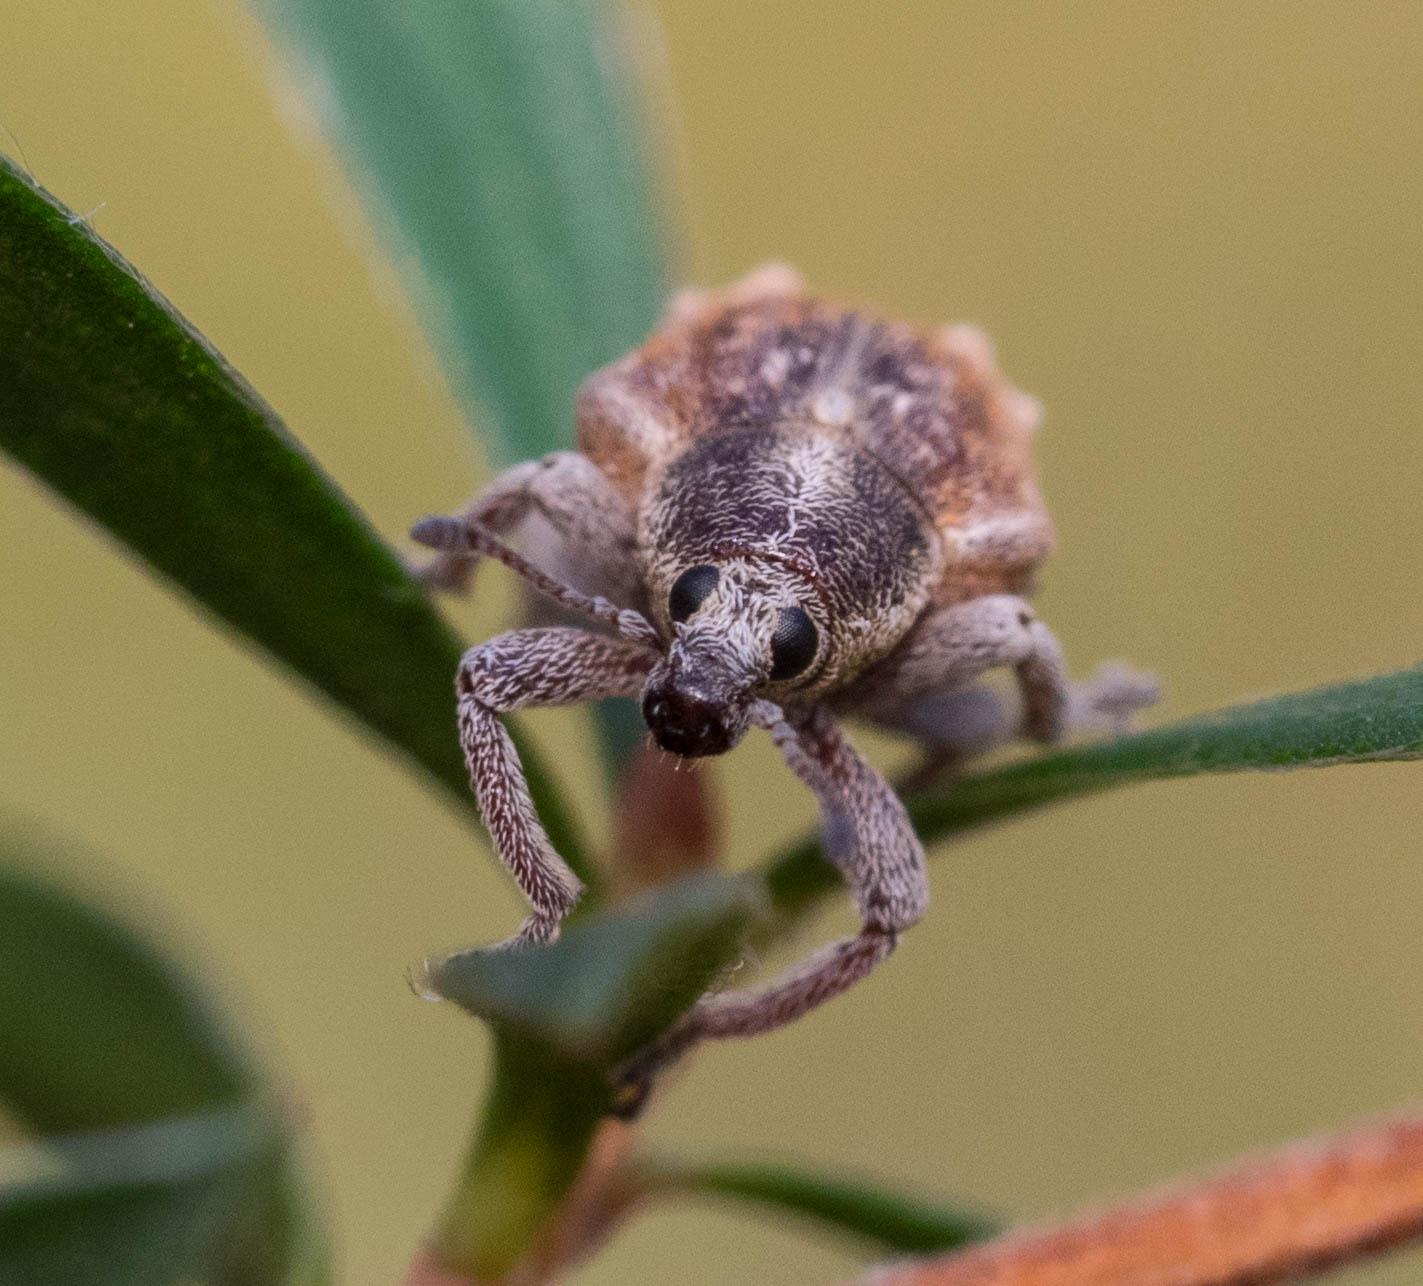 Gonipterus sp ., I think.